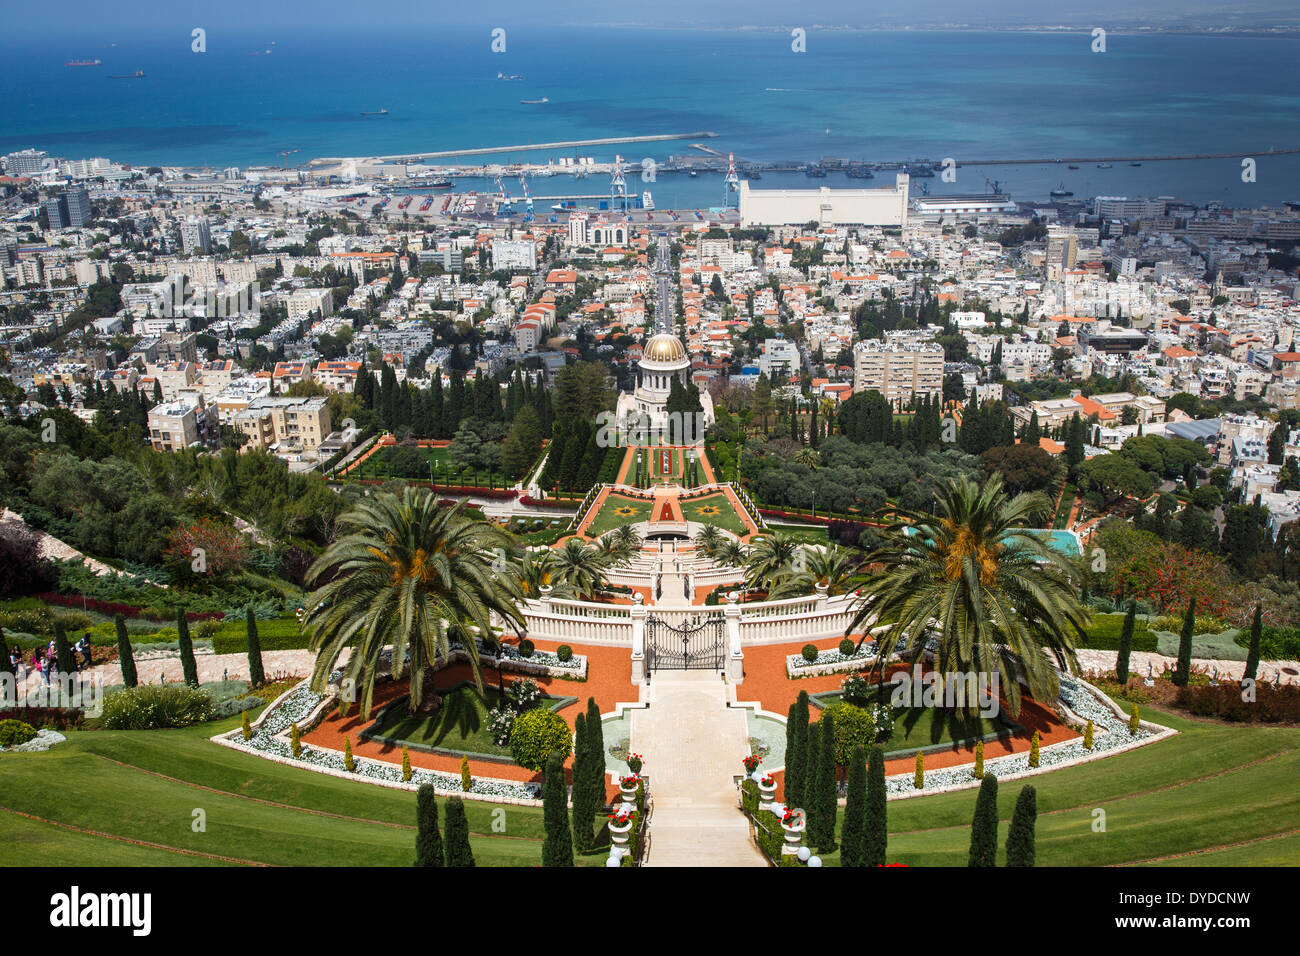 View over the Bahai Gardens, Haifa, Israel. - Stock Image